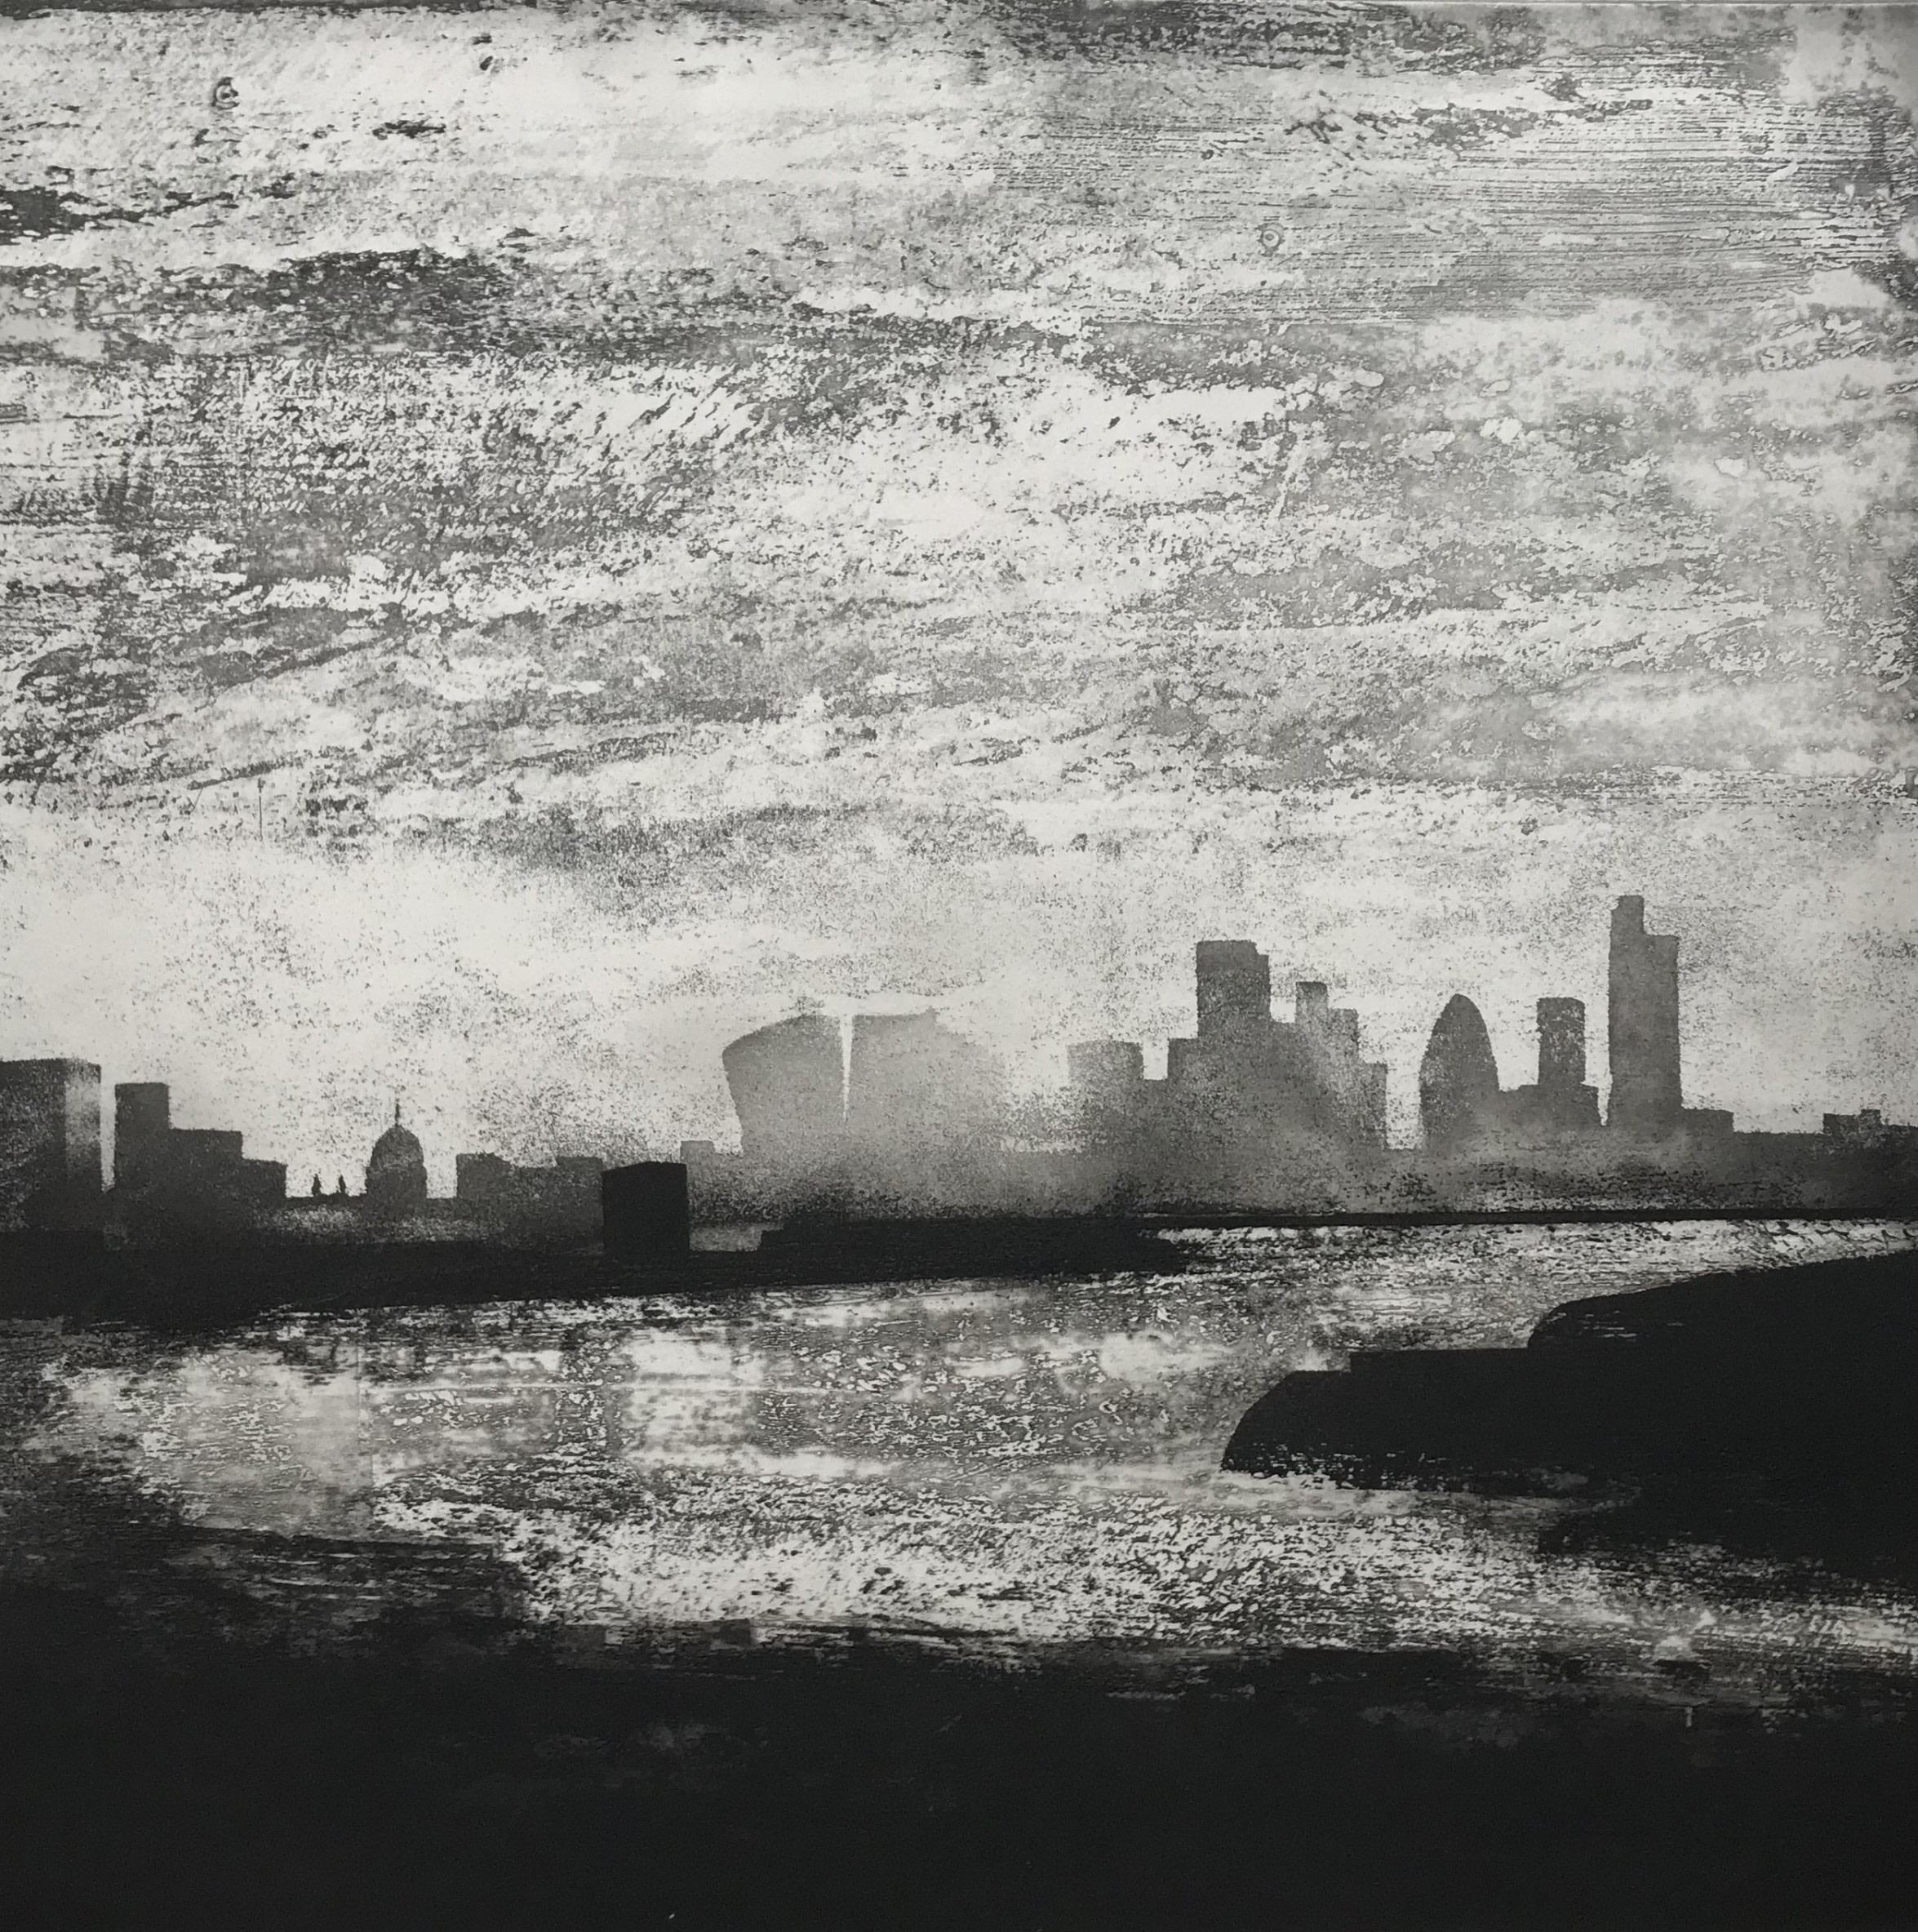 "<span class=""link fancybox-details-link""><a href=""/exhibitions/20/works/artworks_standalone10821/"">View Detail Page</a></span><div class=""artist""><span class=""artist""><strong>Jason Hicklin RE</strong></span></div><div class=""title""><em>The Thames, Greenwich Reach</em></div><div class=""medium"">etching</div><div class=""dimensions"">45.5 x 45 cm image size<br></div><div class=""edition_details"">edition of 30</div>"